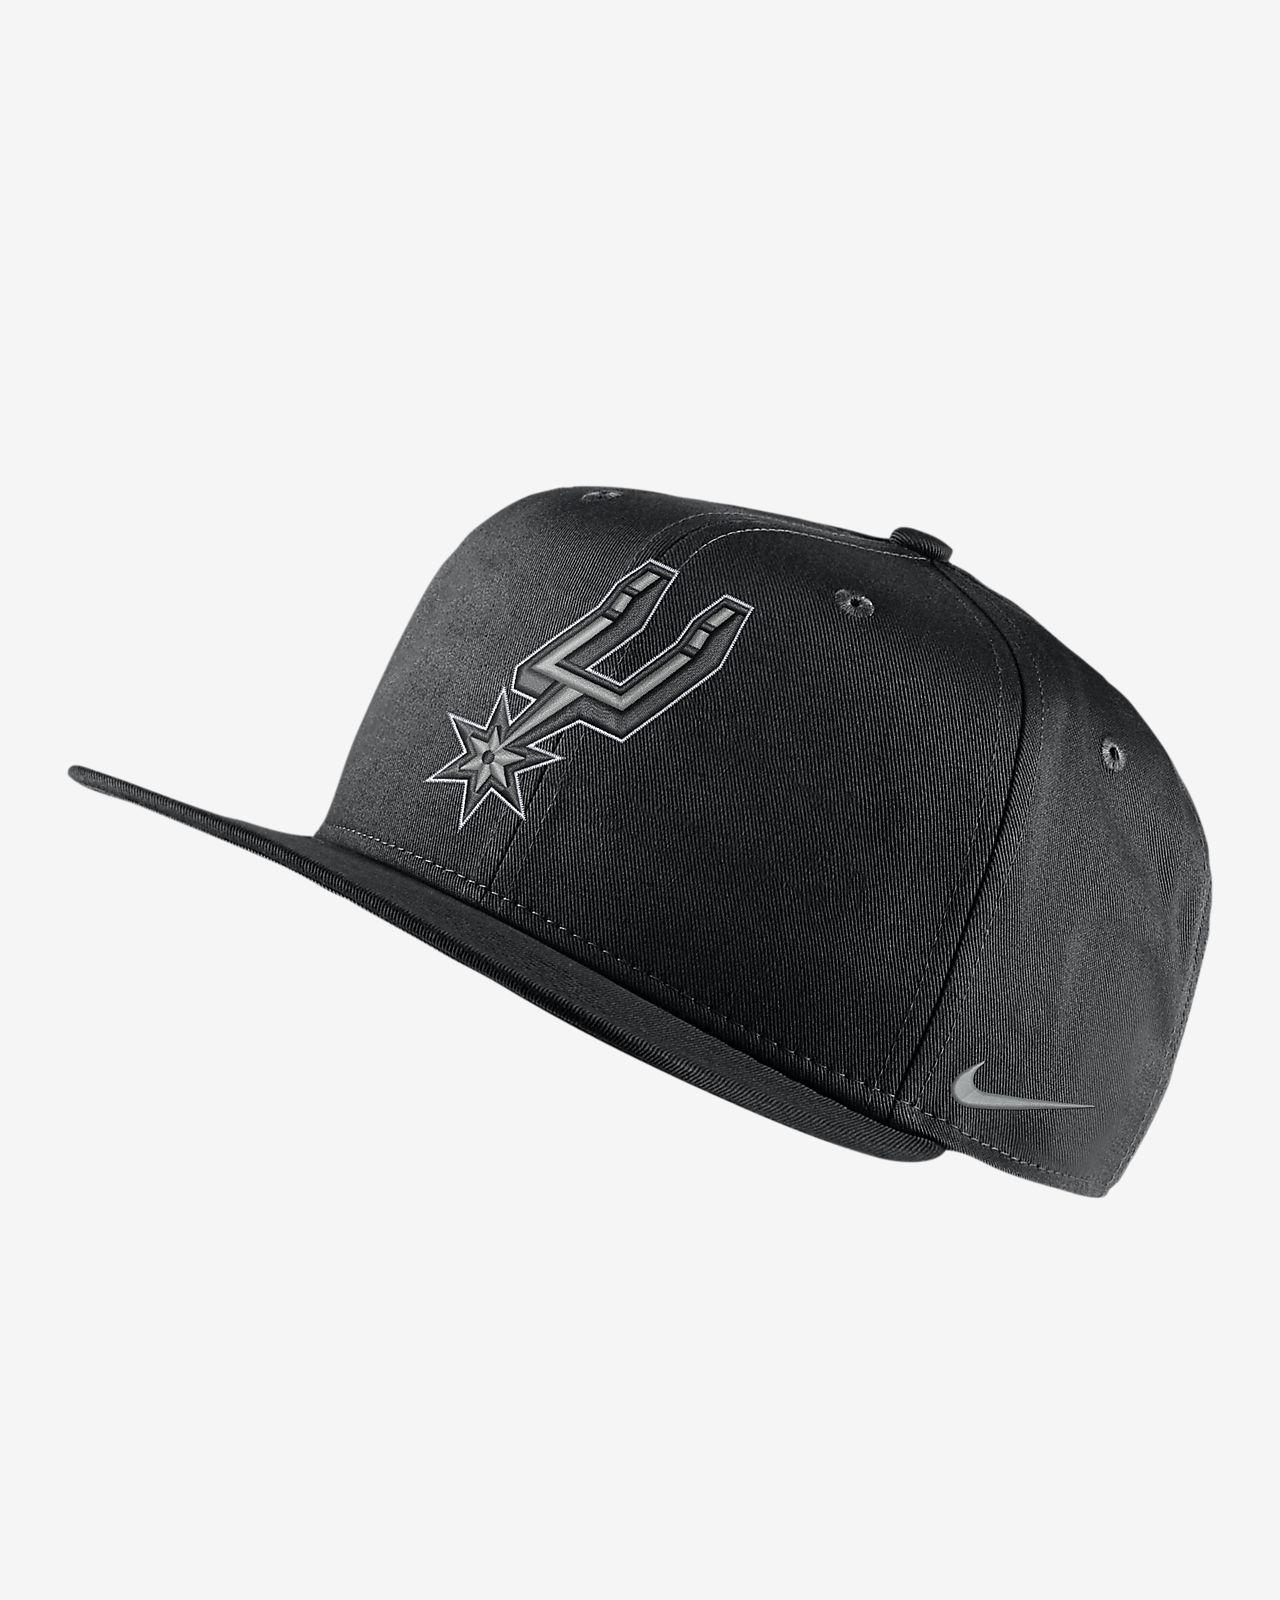 San Antonio Spurs Nike Pro NBA-s sapka